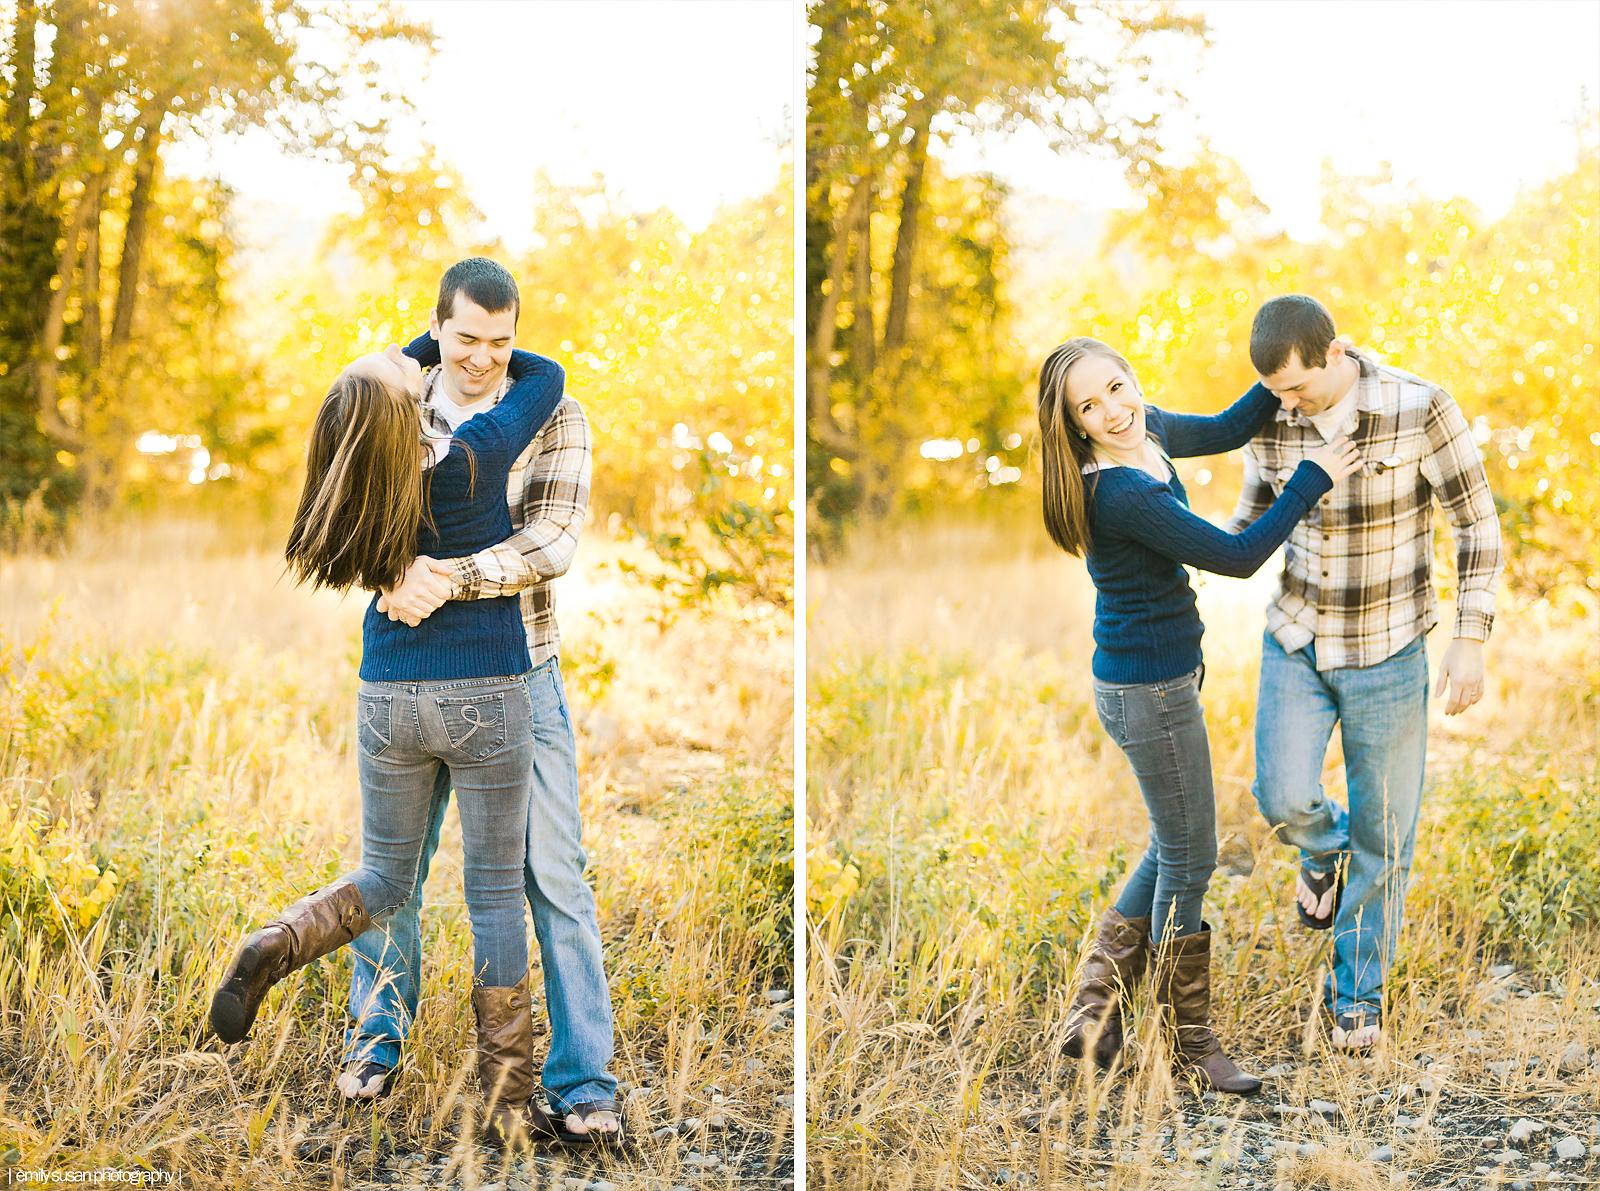 minneapolis_fall_engagement_photography_002.jpg